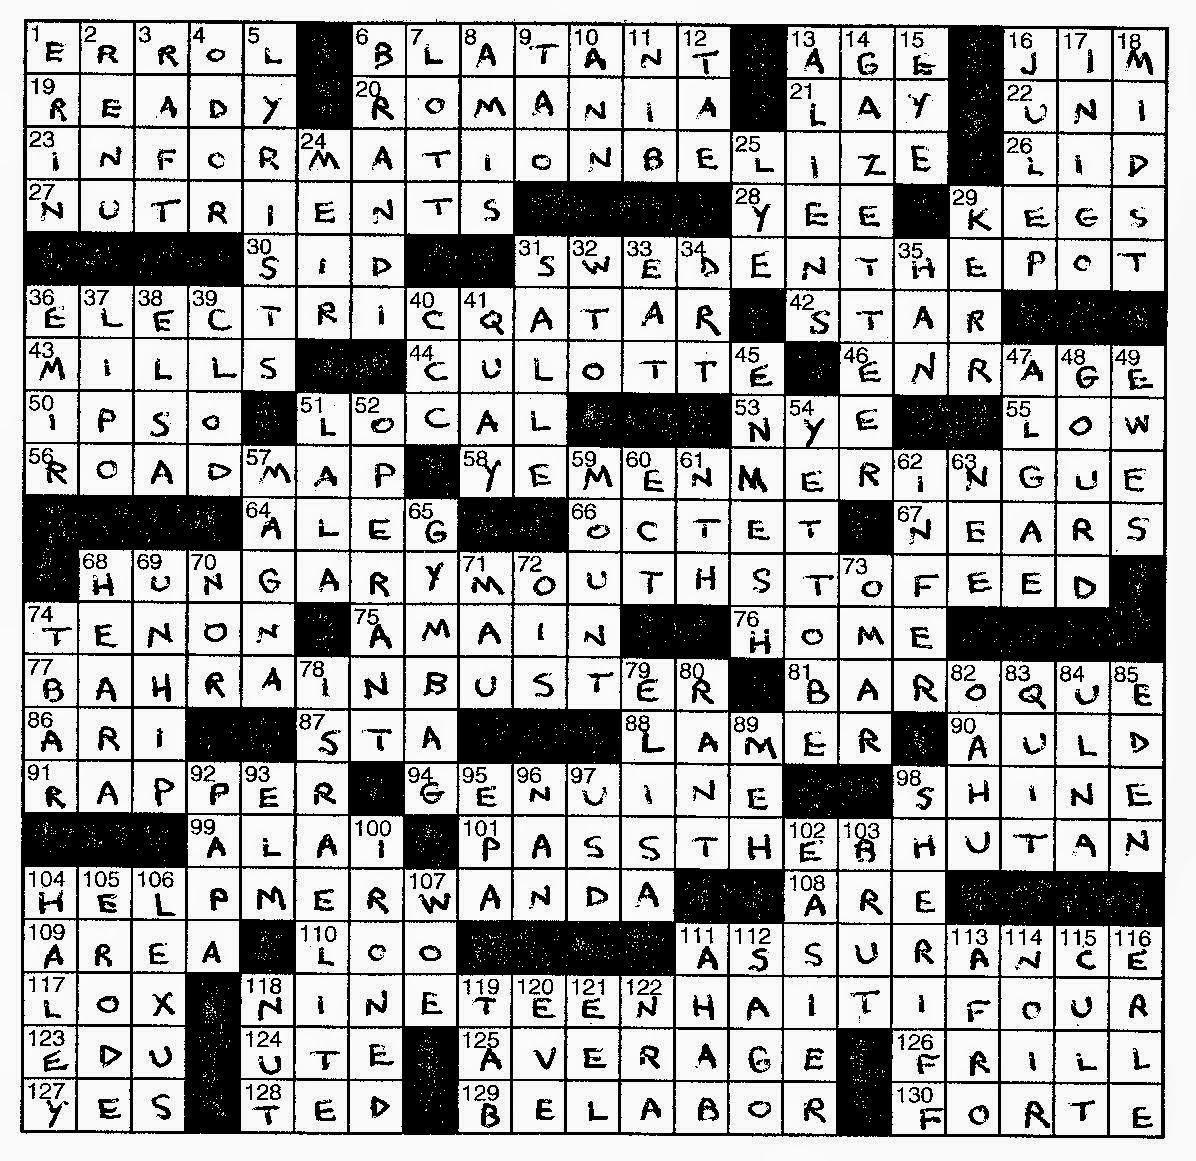 Lem's Levity: Port Cities - Printable Frank Longo Crossword Puzzles